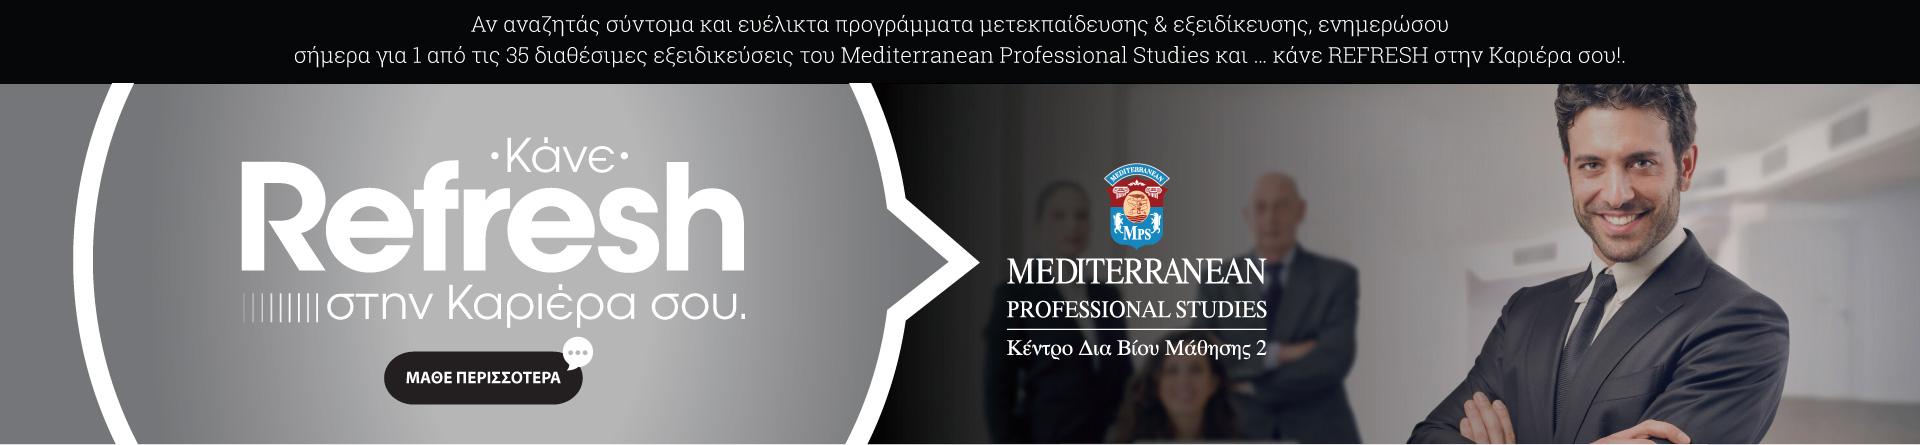 metaptyxiaka-μεταπτυχιακα-Mediterranean college